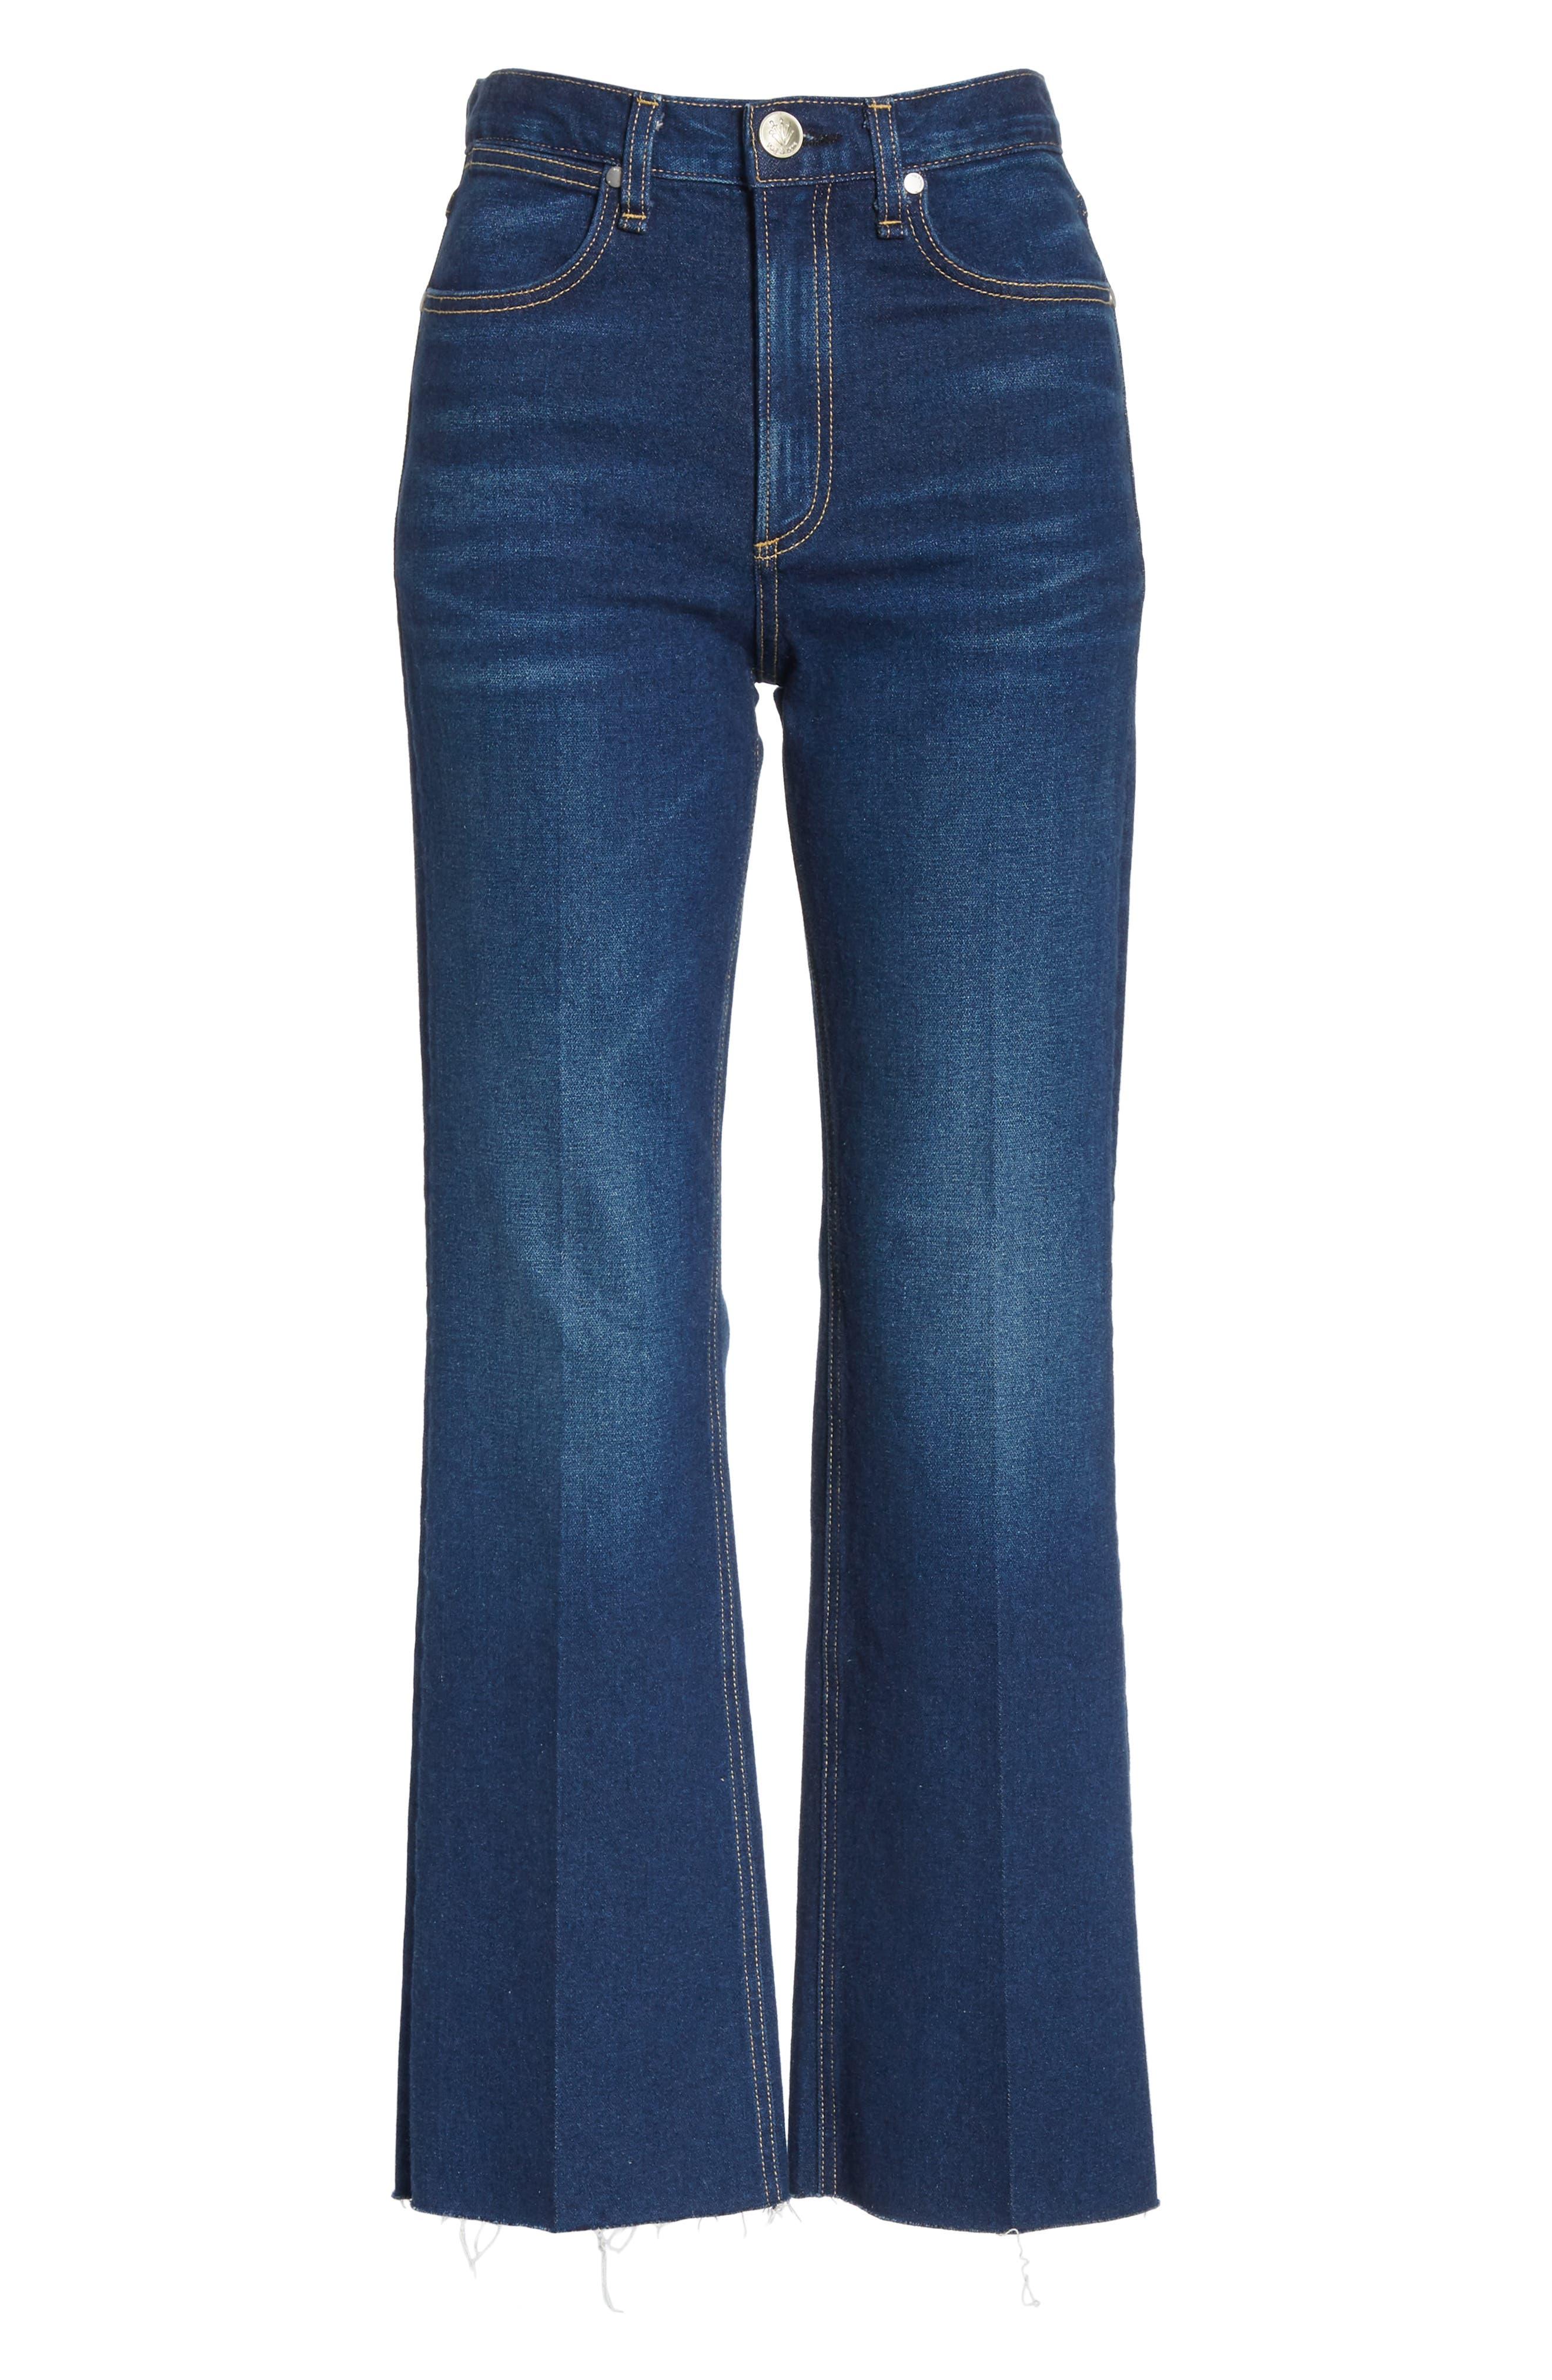 RAG & BONE,                             Justine High Waist Crop Wide Leg Jeans,                             Alternate thumbnail 7, color,                             410